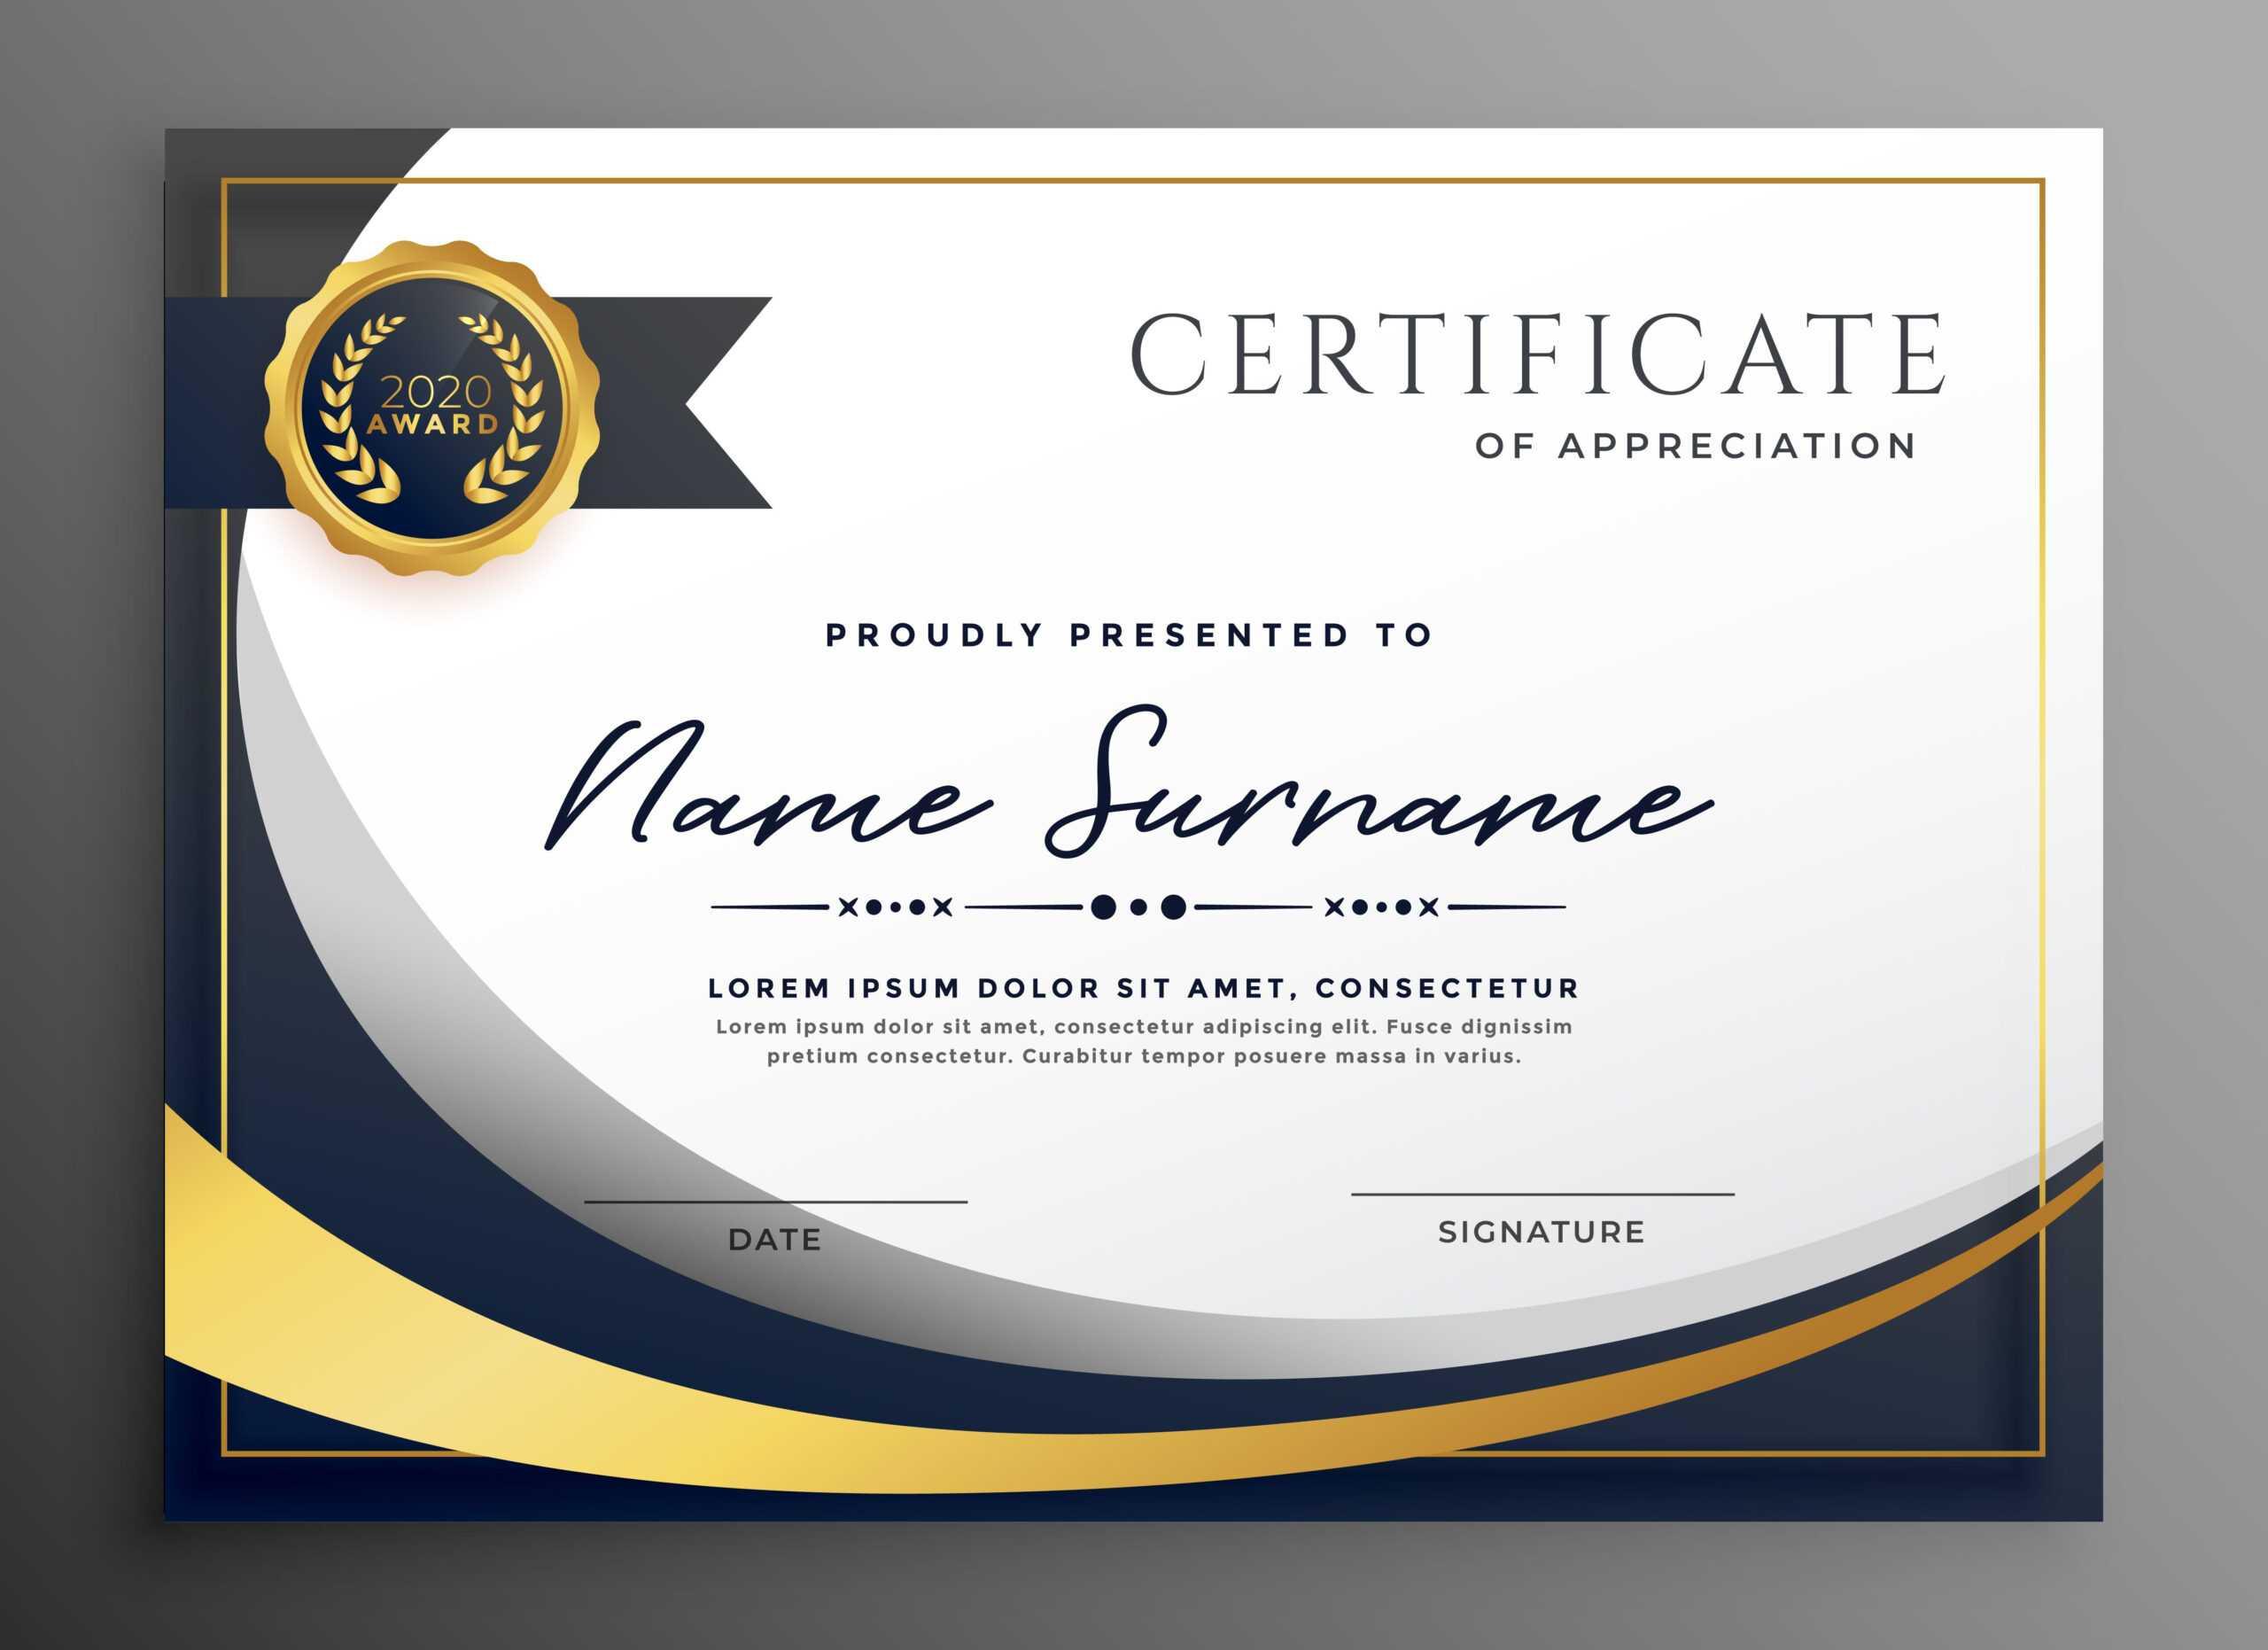 Premium Wavy Certificate Template Design   Certificate Intended For Award Certificate Design Template